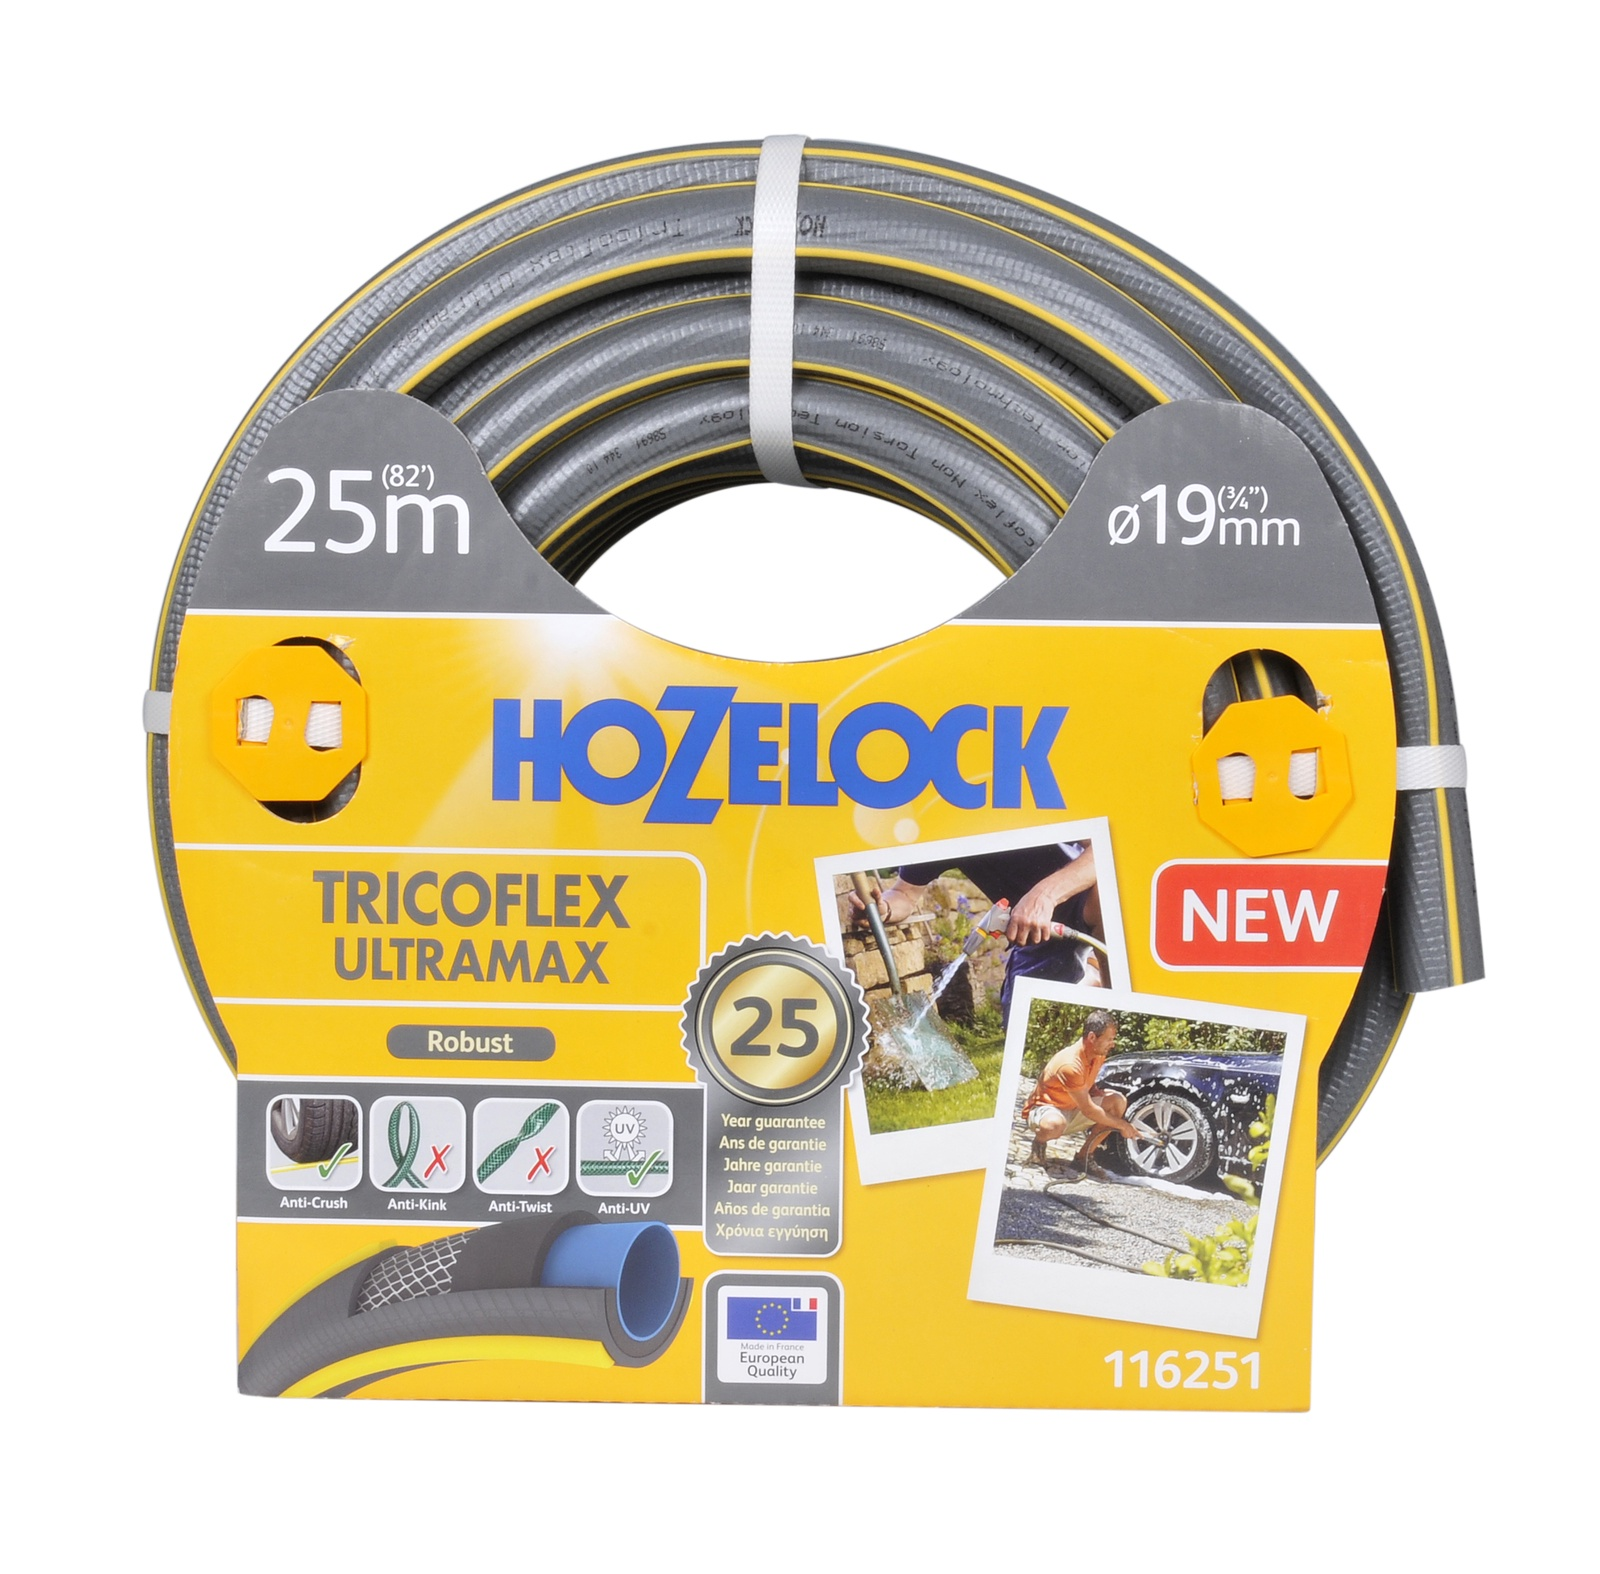 "Шланг поливочный Hozelock ""Tricoflex Ultramax"" 116251, 3/4"" 25 м, серый, желтый"